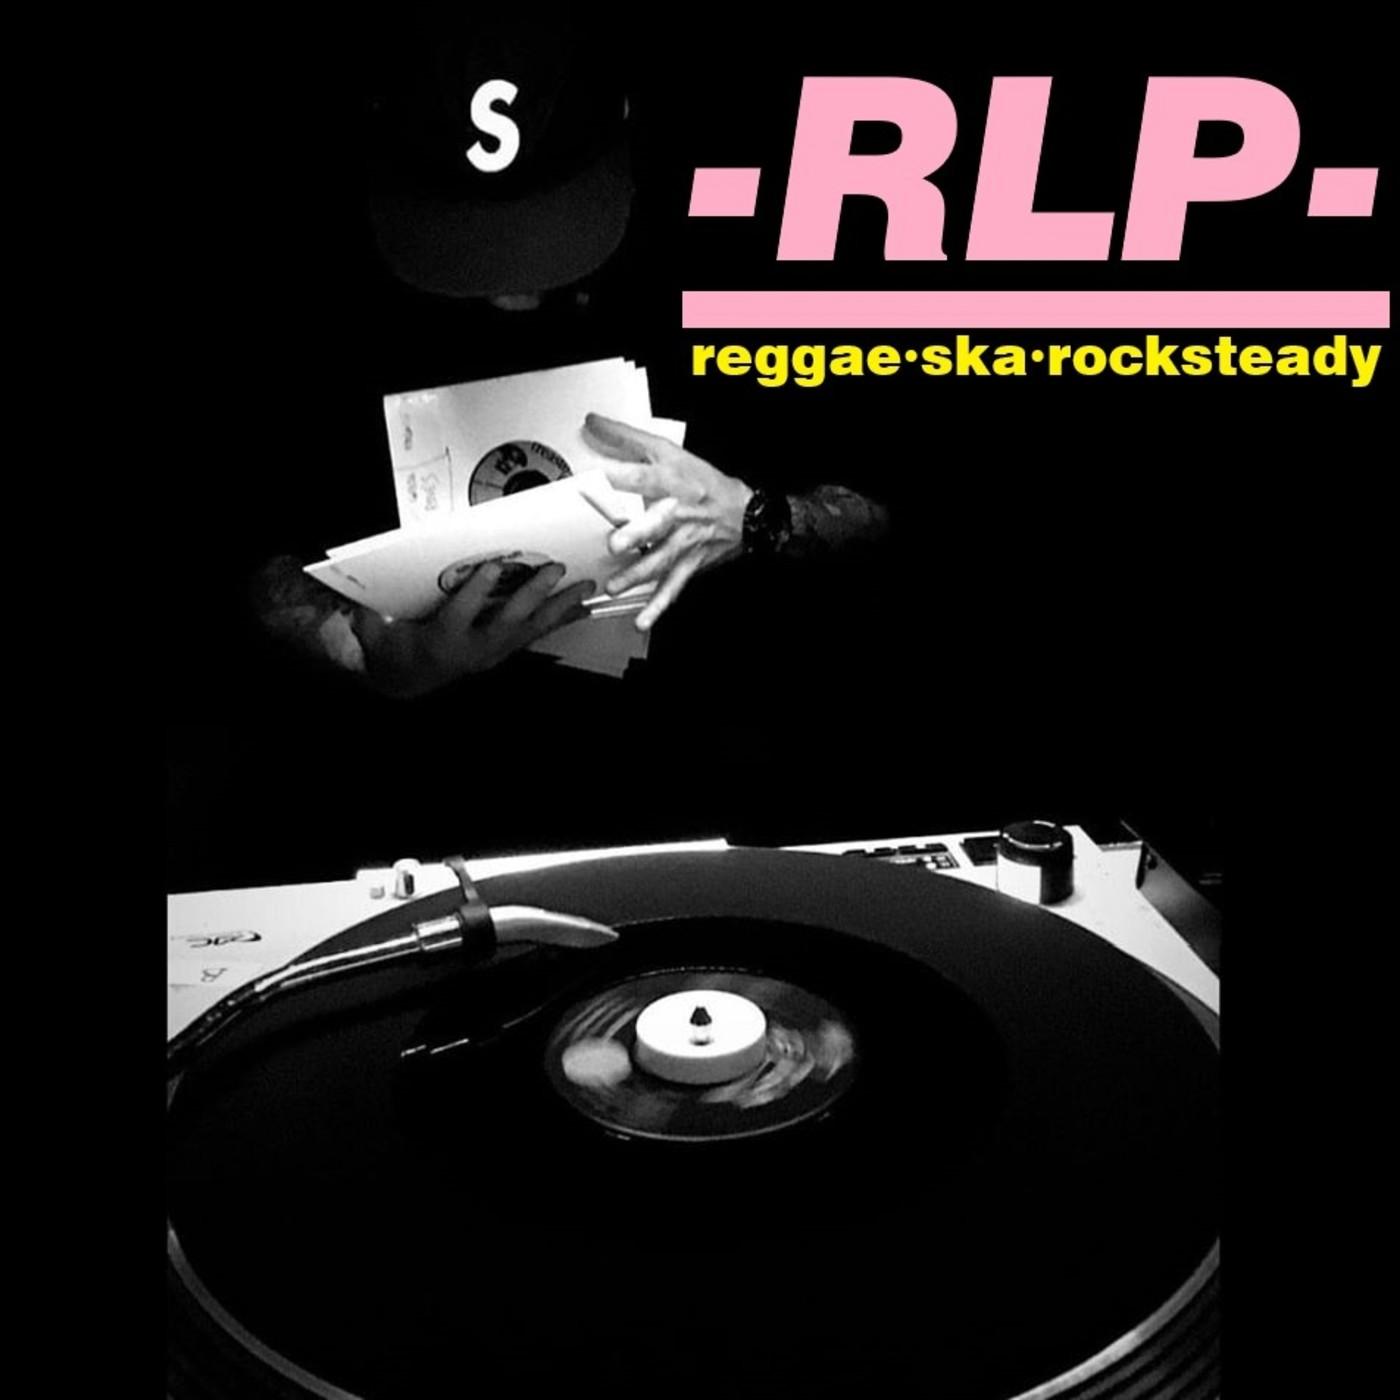 RLP (REGGAE-SKA-ROCKSTEADY)